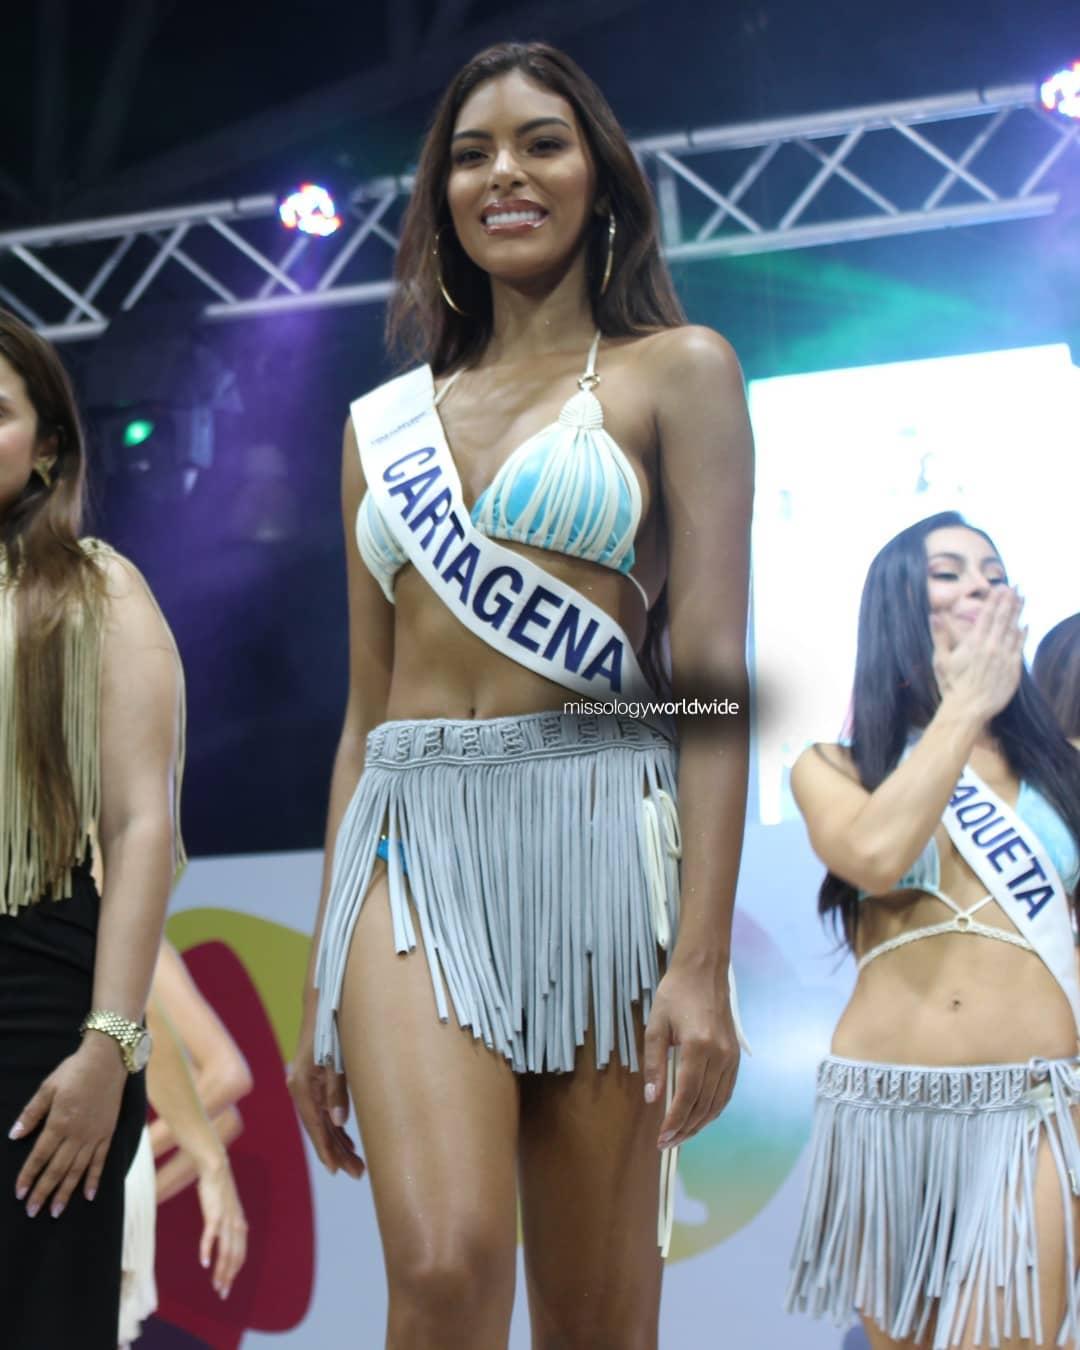 valeria ayos bossa, miss universe colombia 2021/miss water earth 2018. - Página 21 Dmzflm10